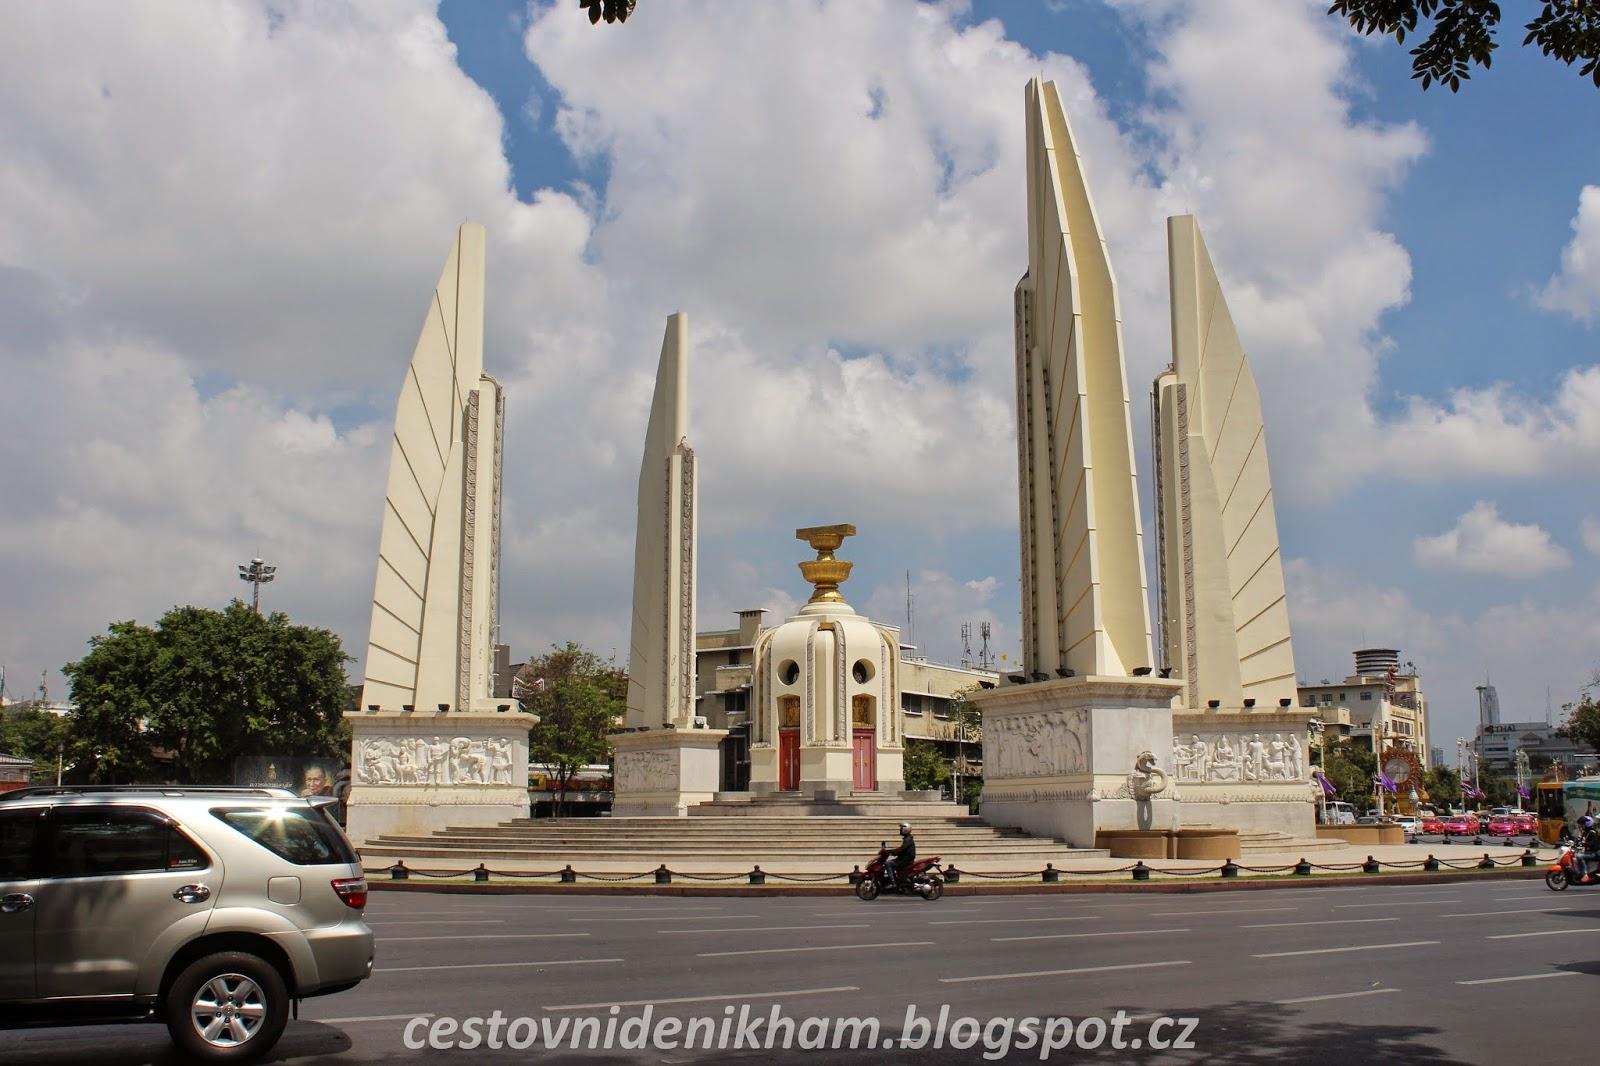 Památník demokracie // Democracy Monument